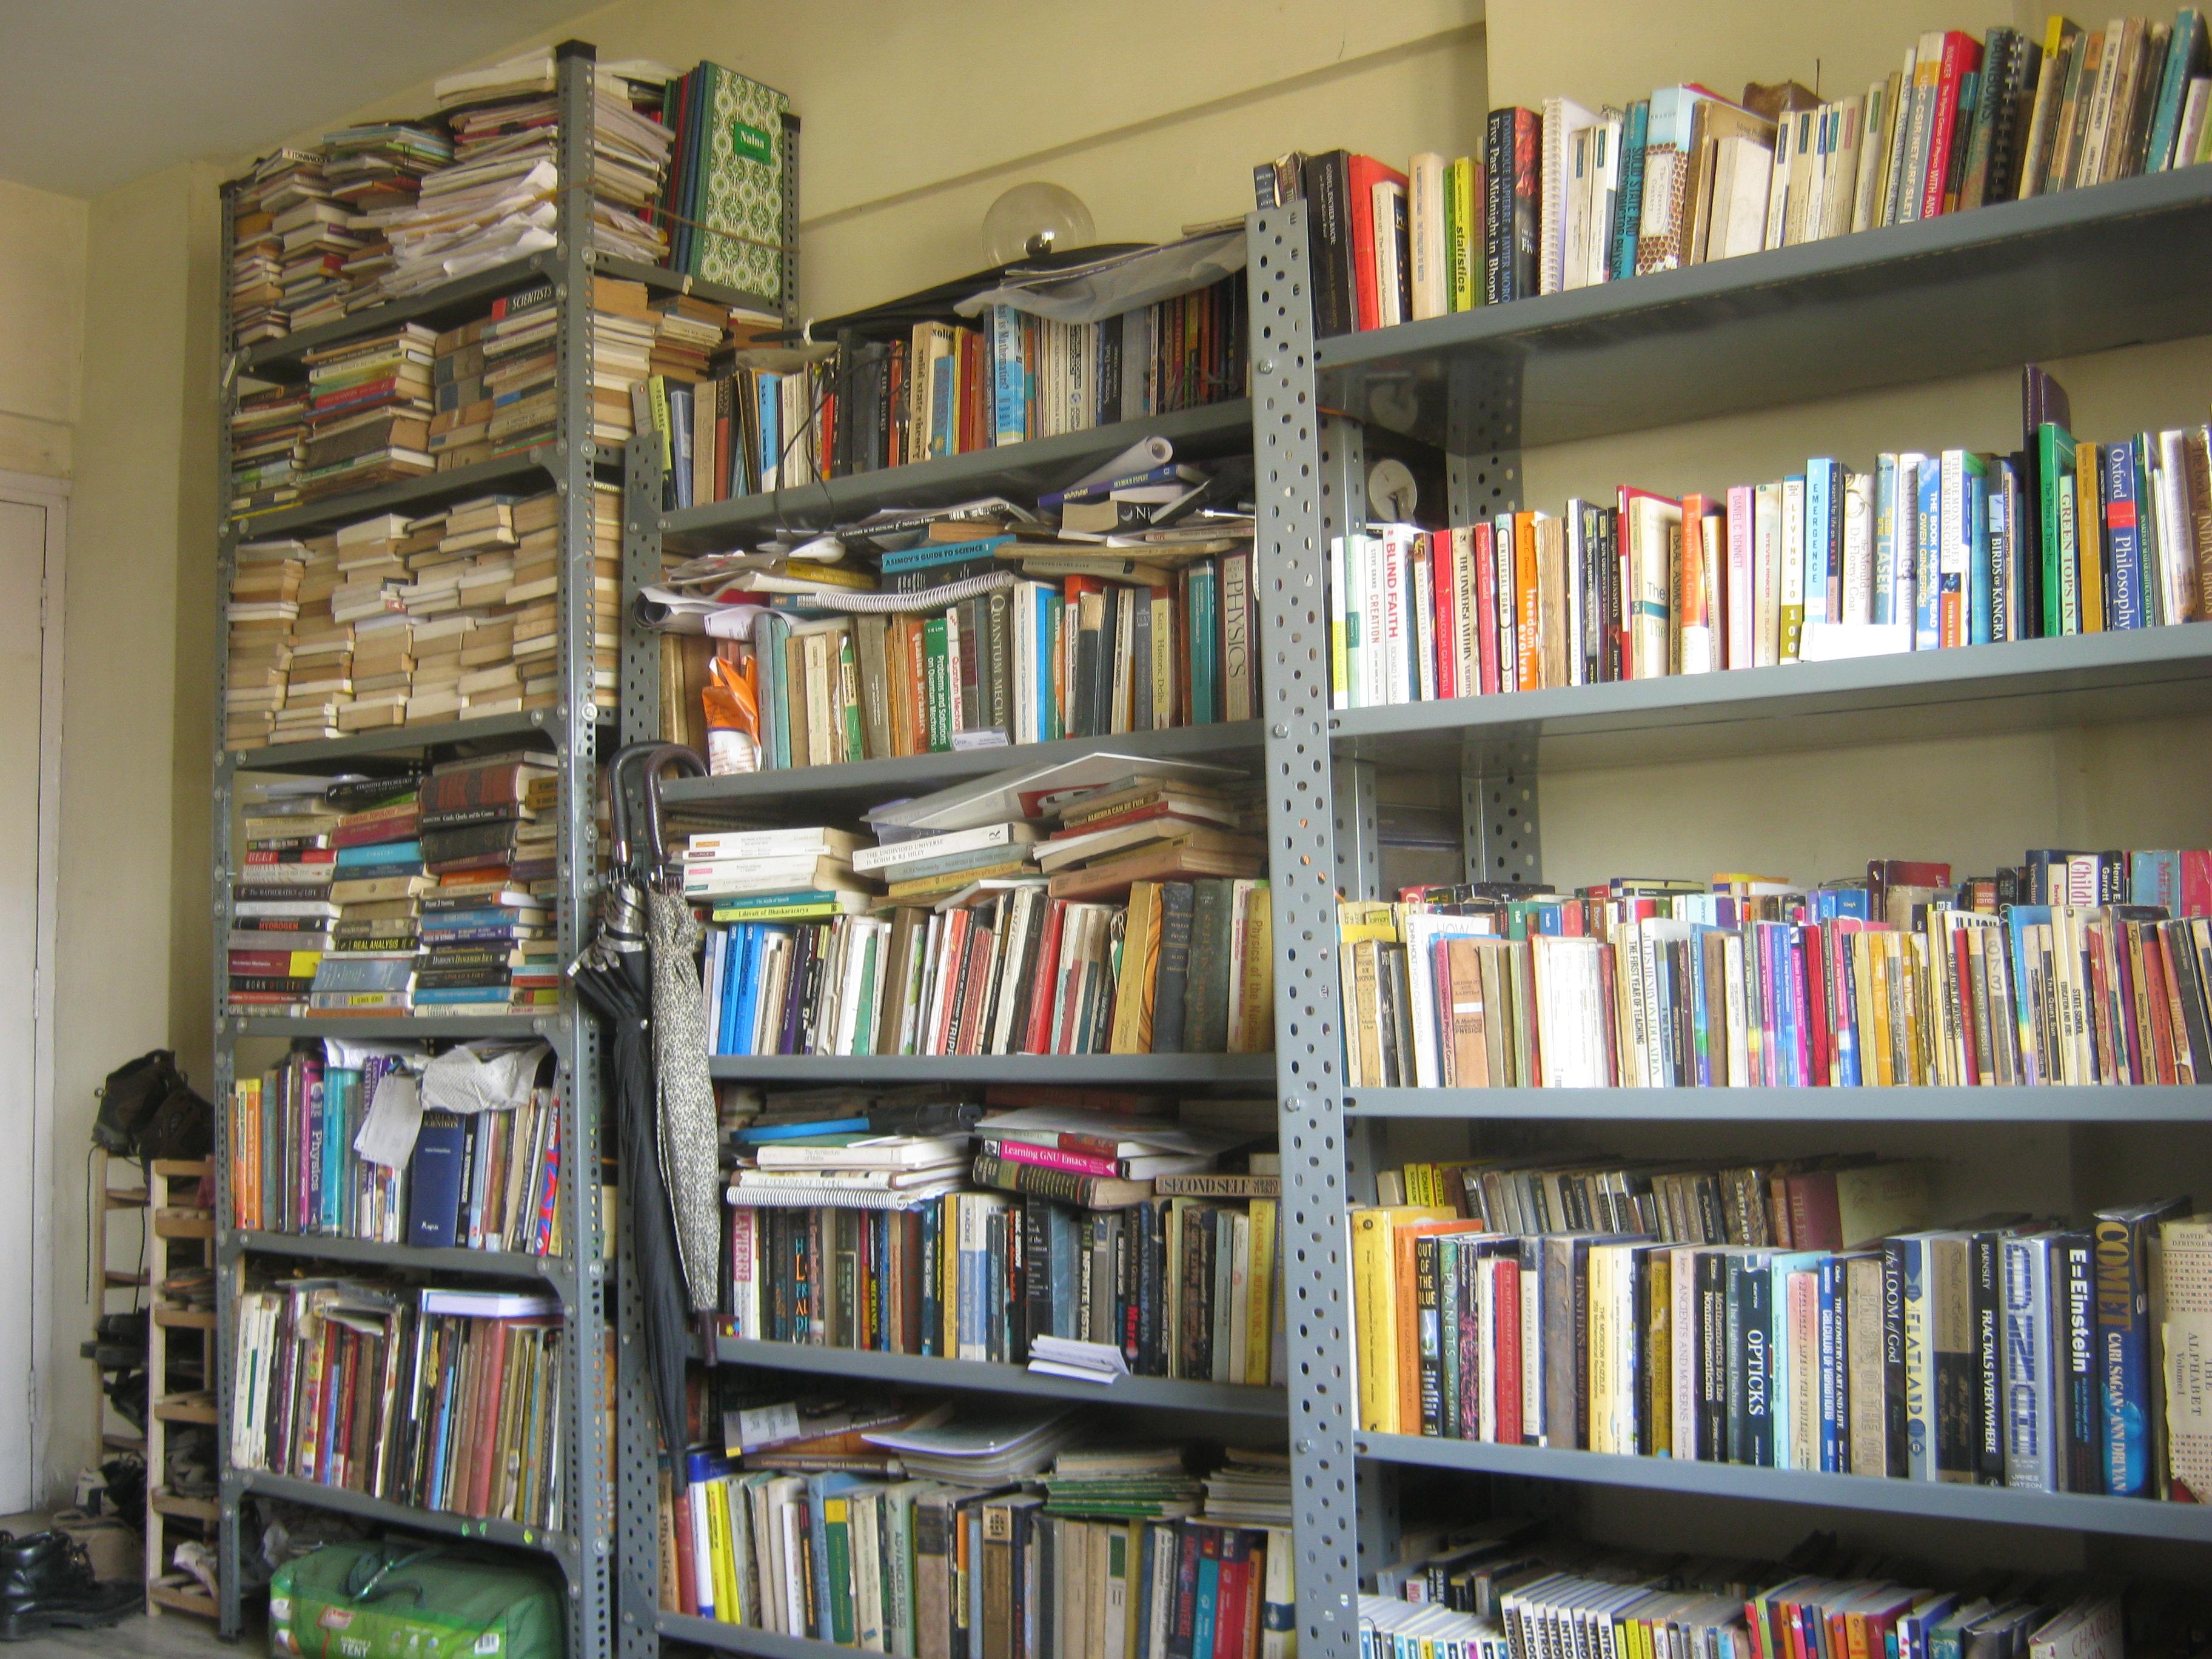 New bookshelf has arrived mir books ds bookshelves img4055 img4056 img4058 fandeluxe Image collections